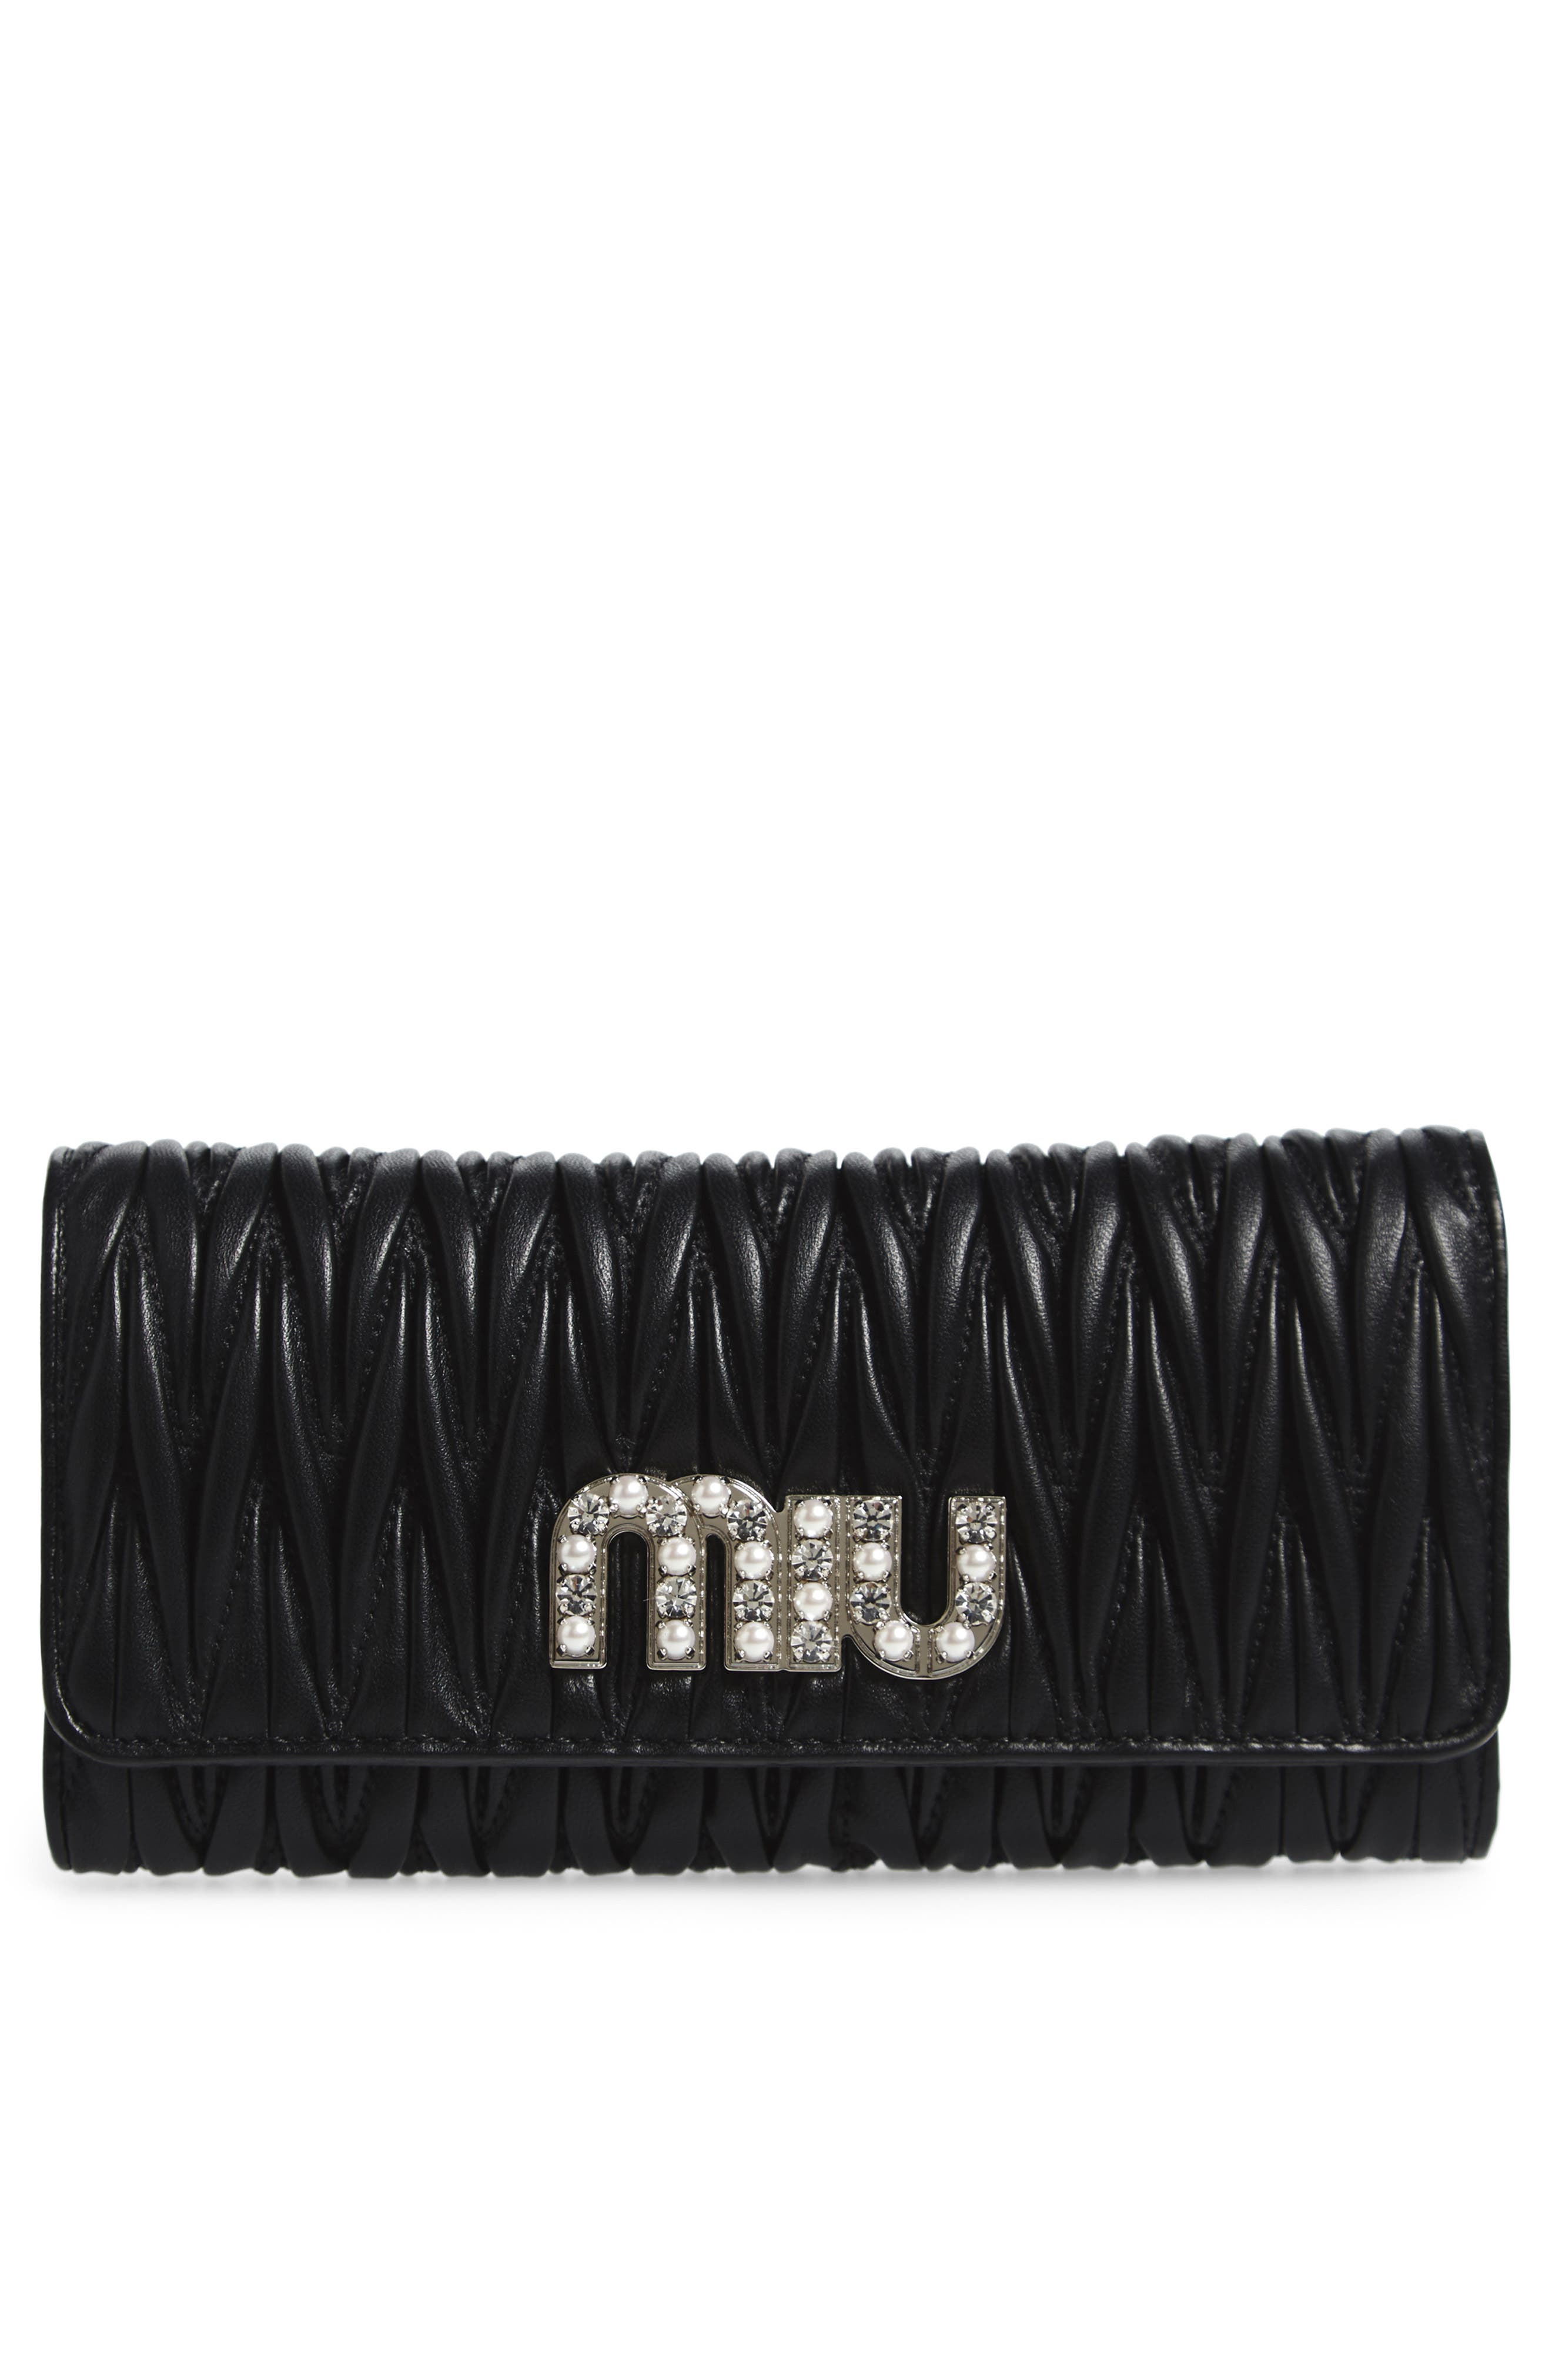 Alternate Image 1 Selected - Miu Miu Embellished Logo Matelassé Leather Continental Wallet